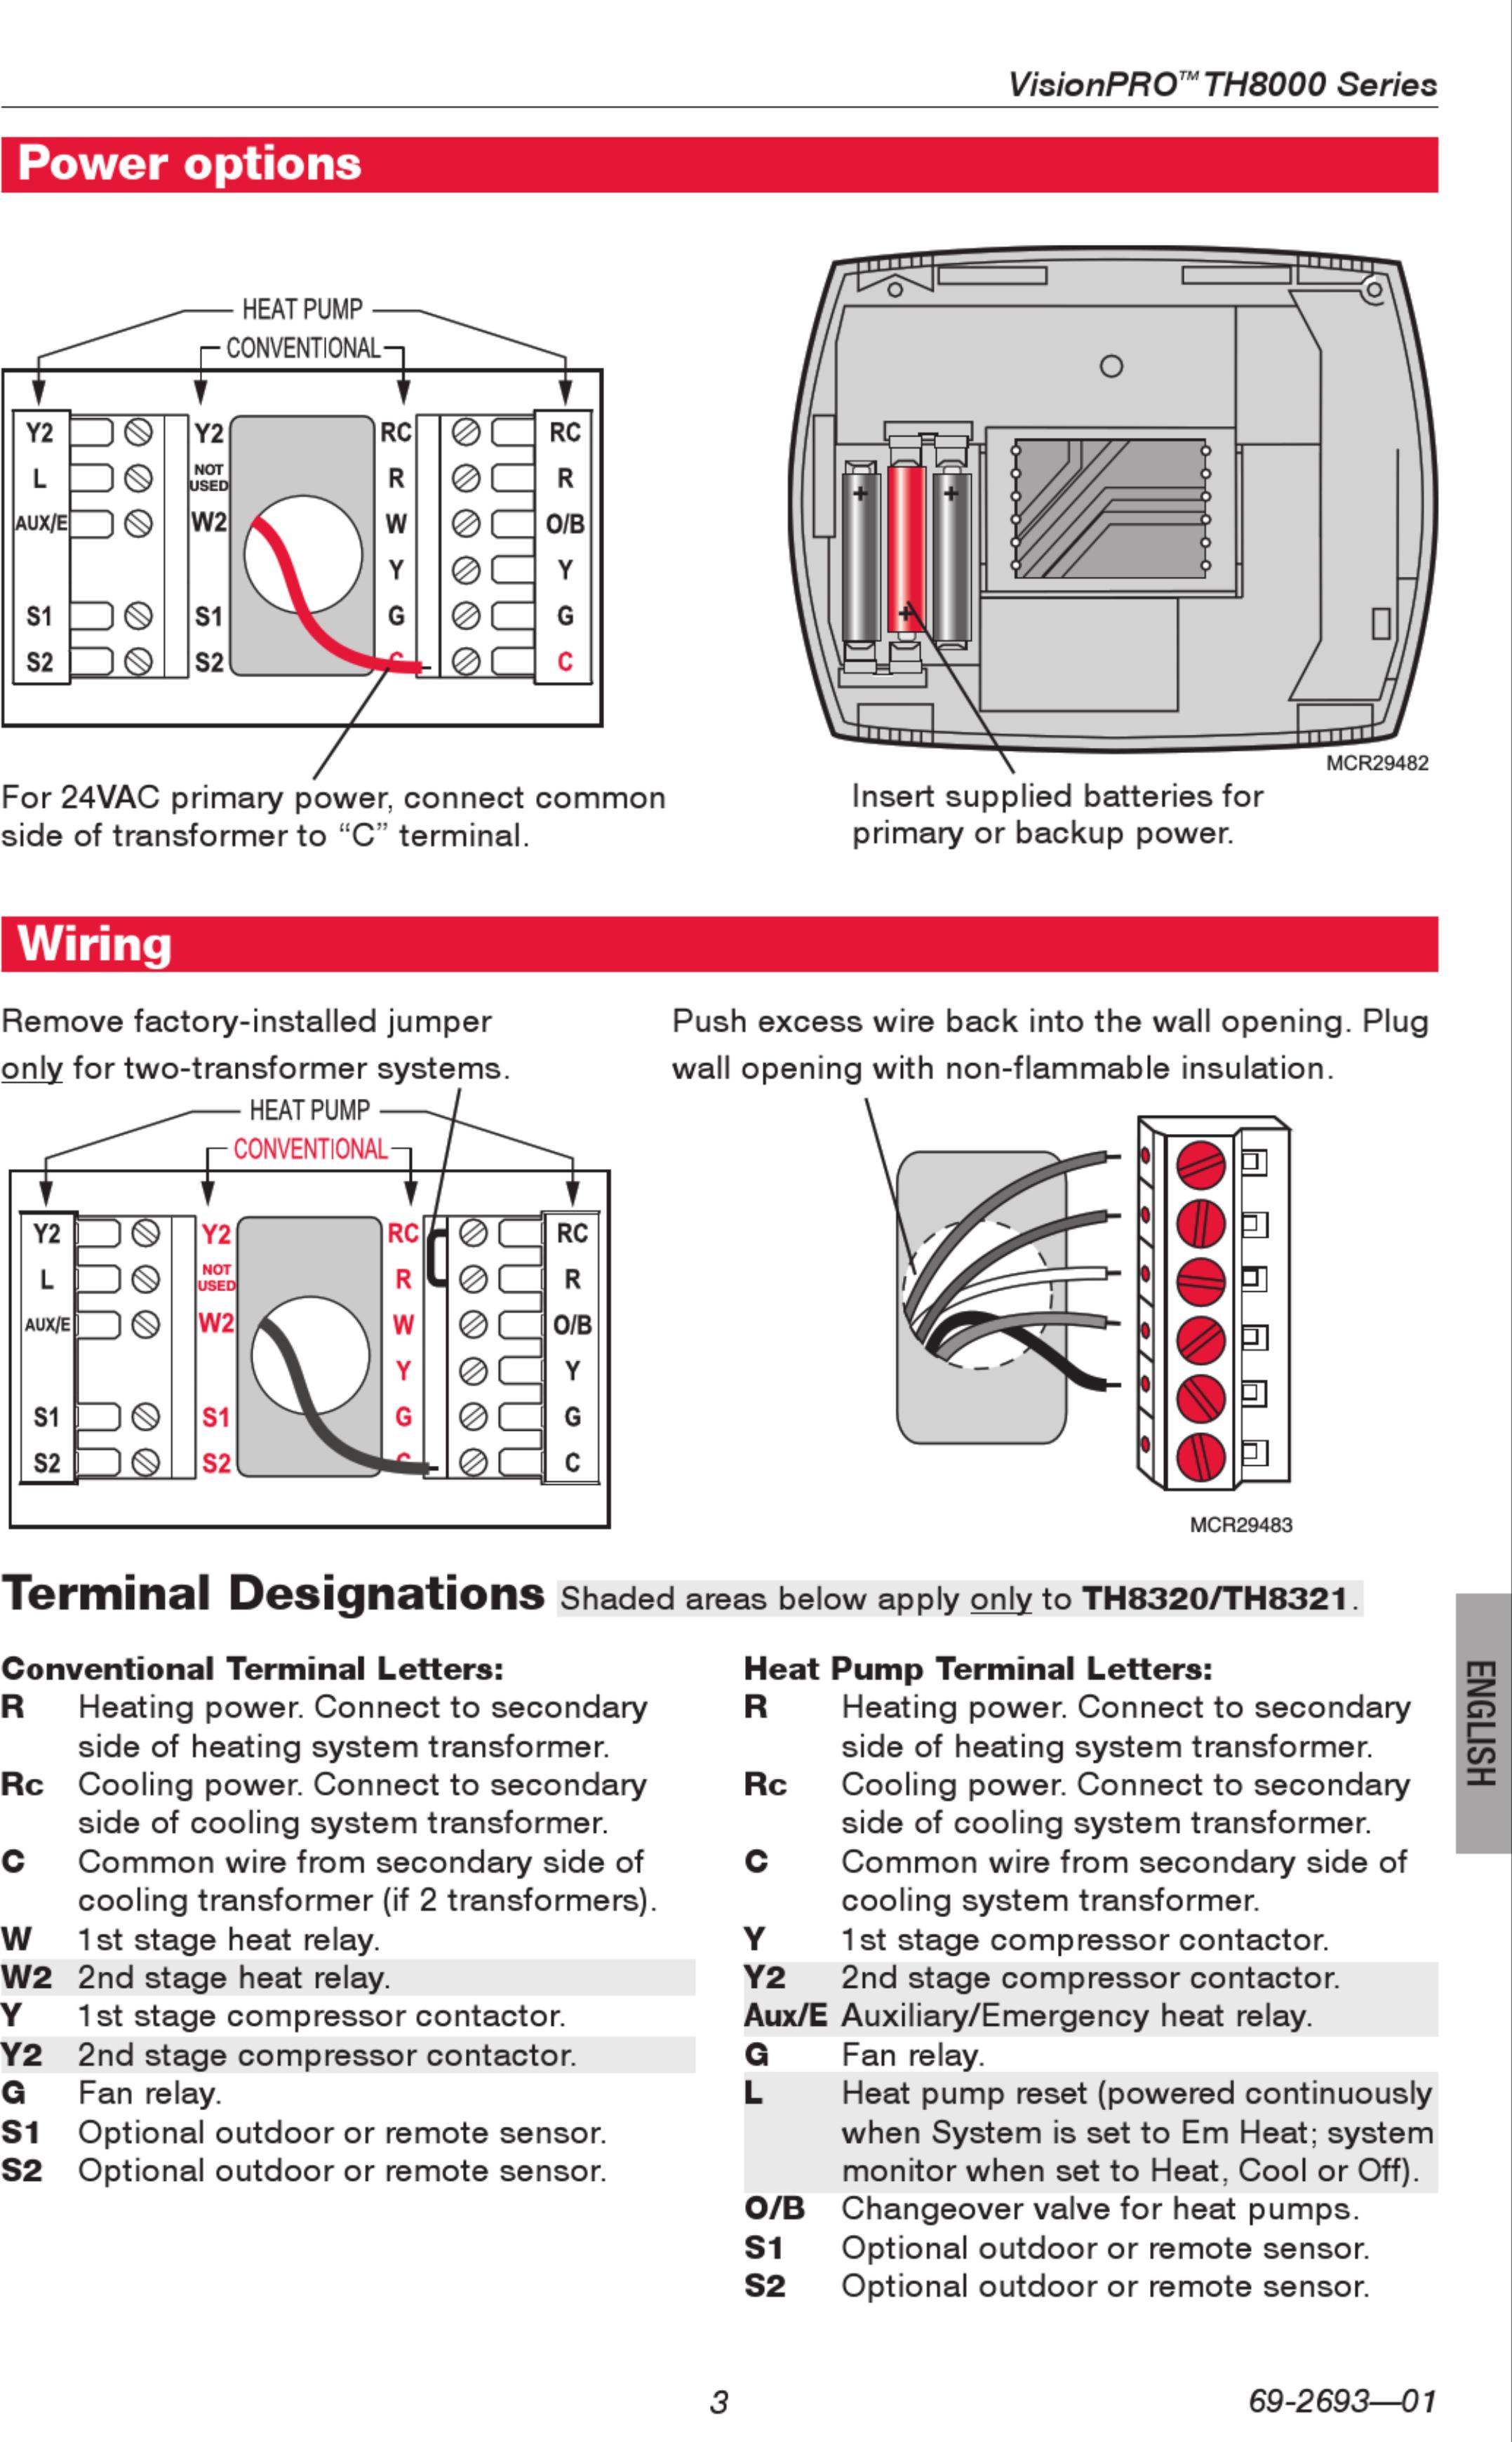 Visionpro Iaq Wiring Diagram border=